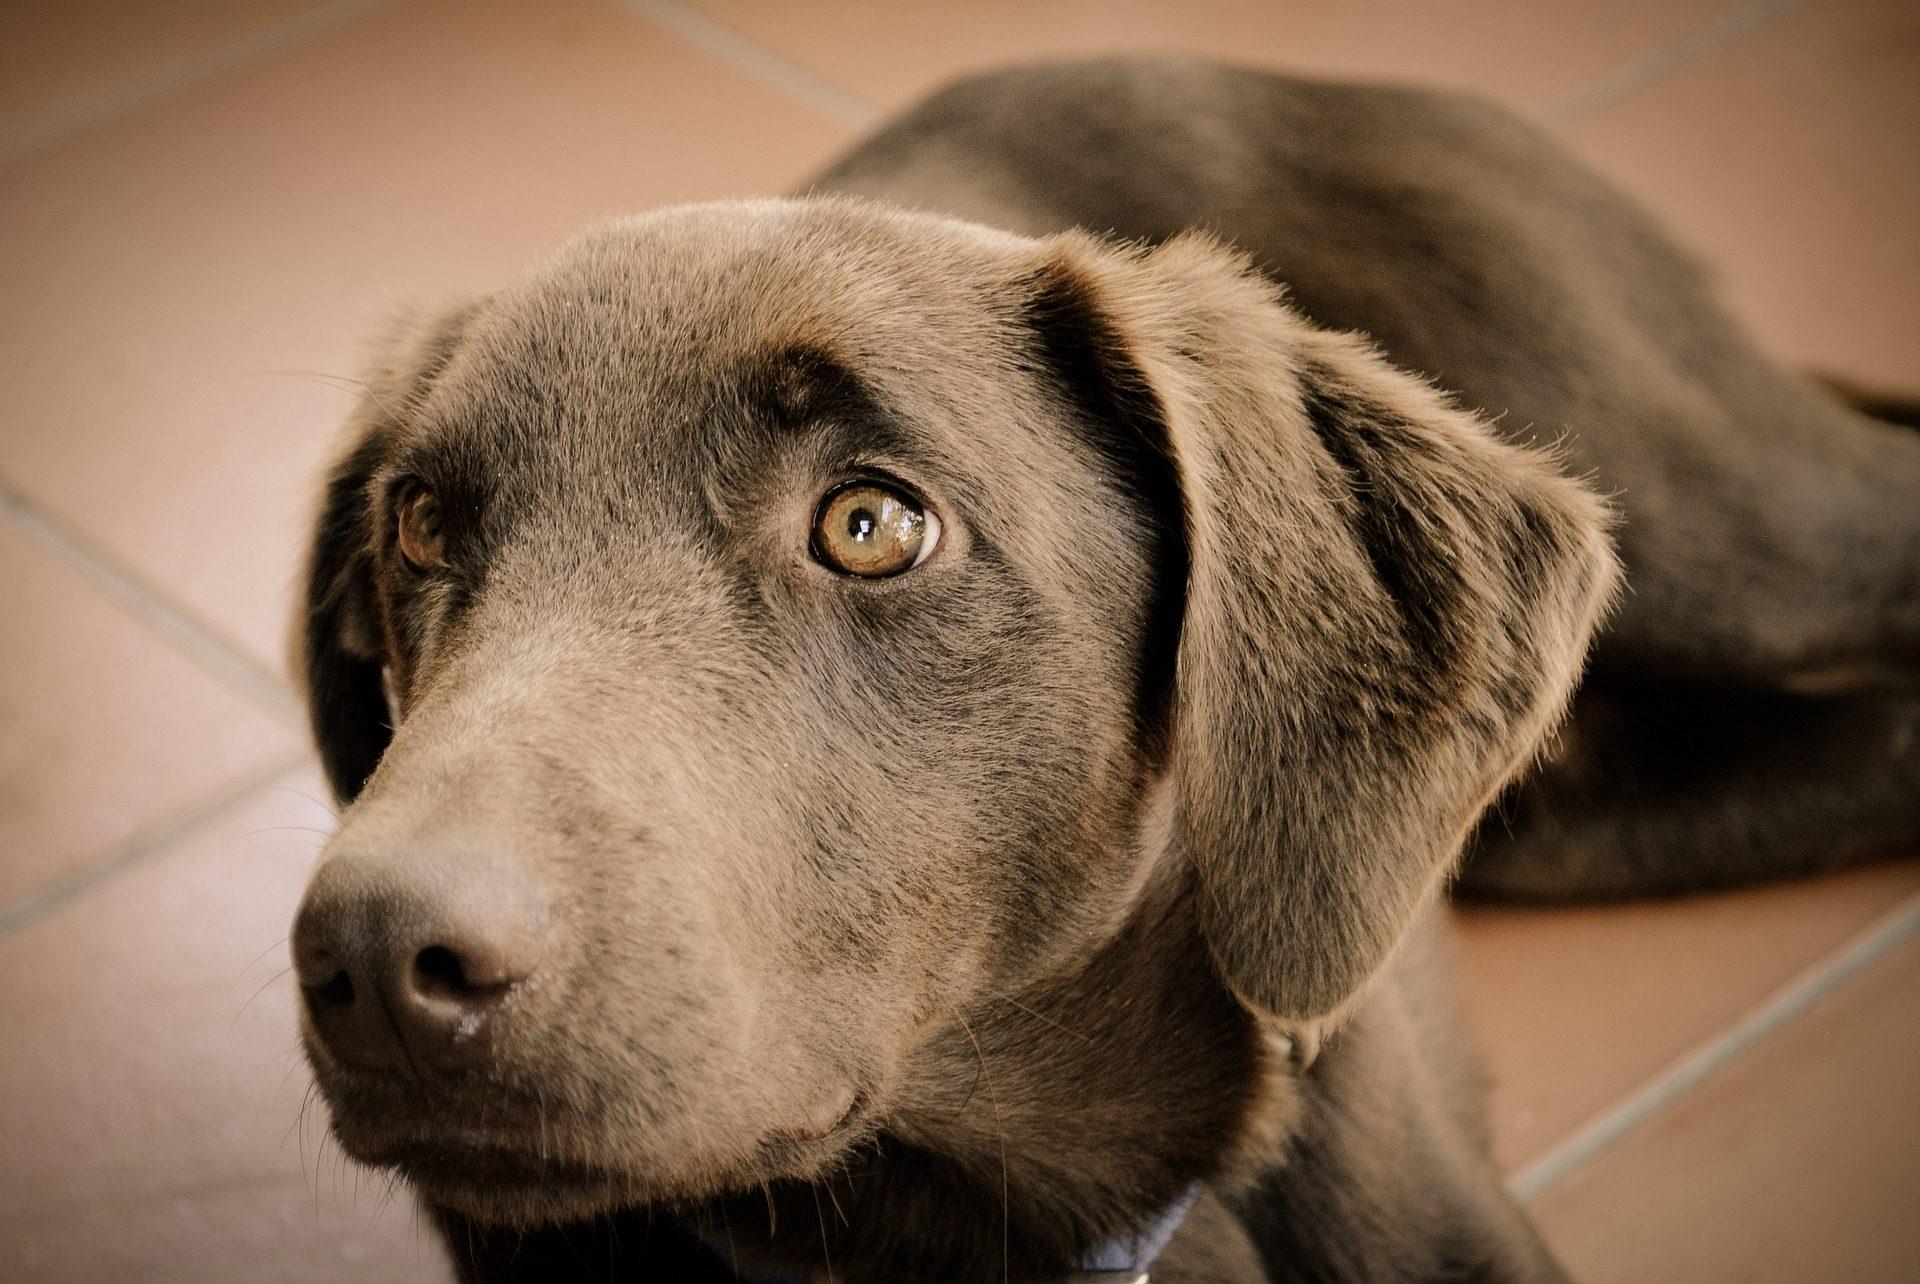 perro, cachorro, mascota, amigo, mirada, pelaje - Fondos de Pantalla HD - professor-falken.com